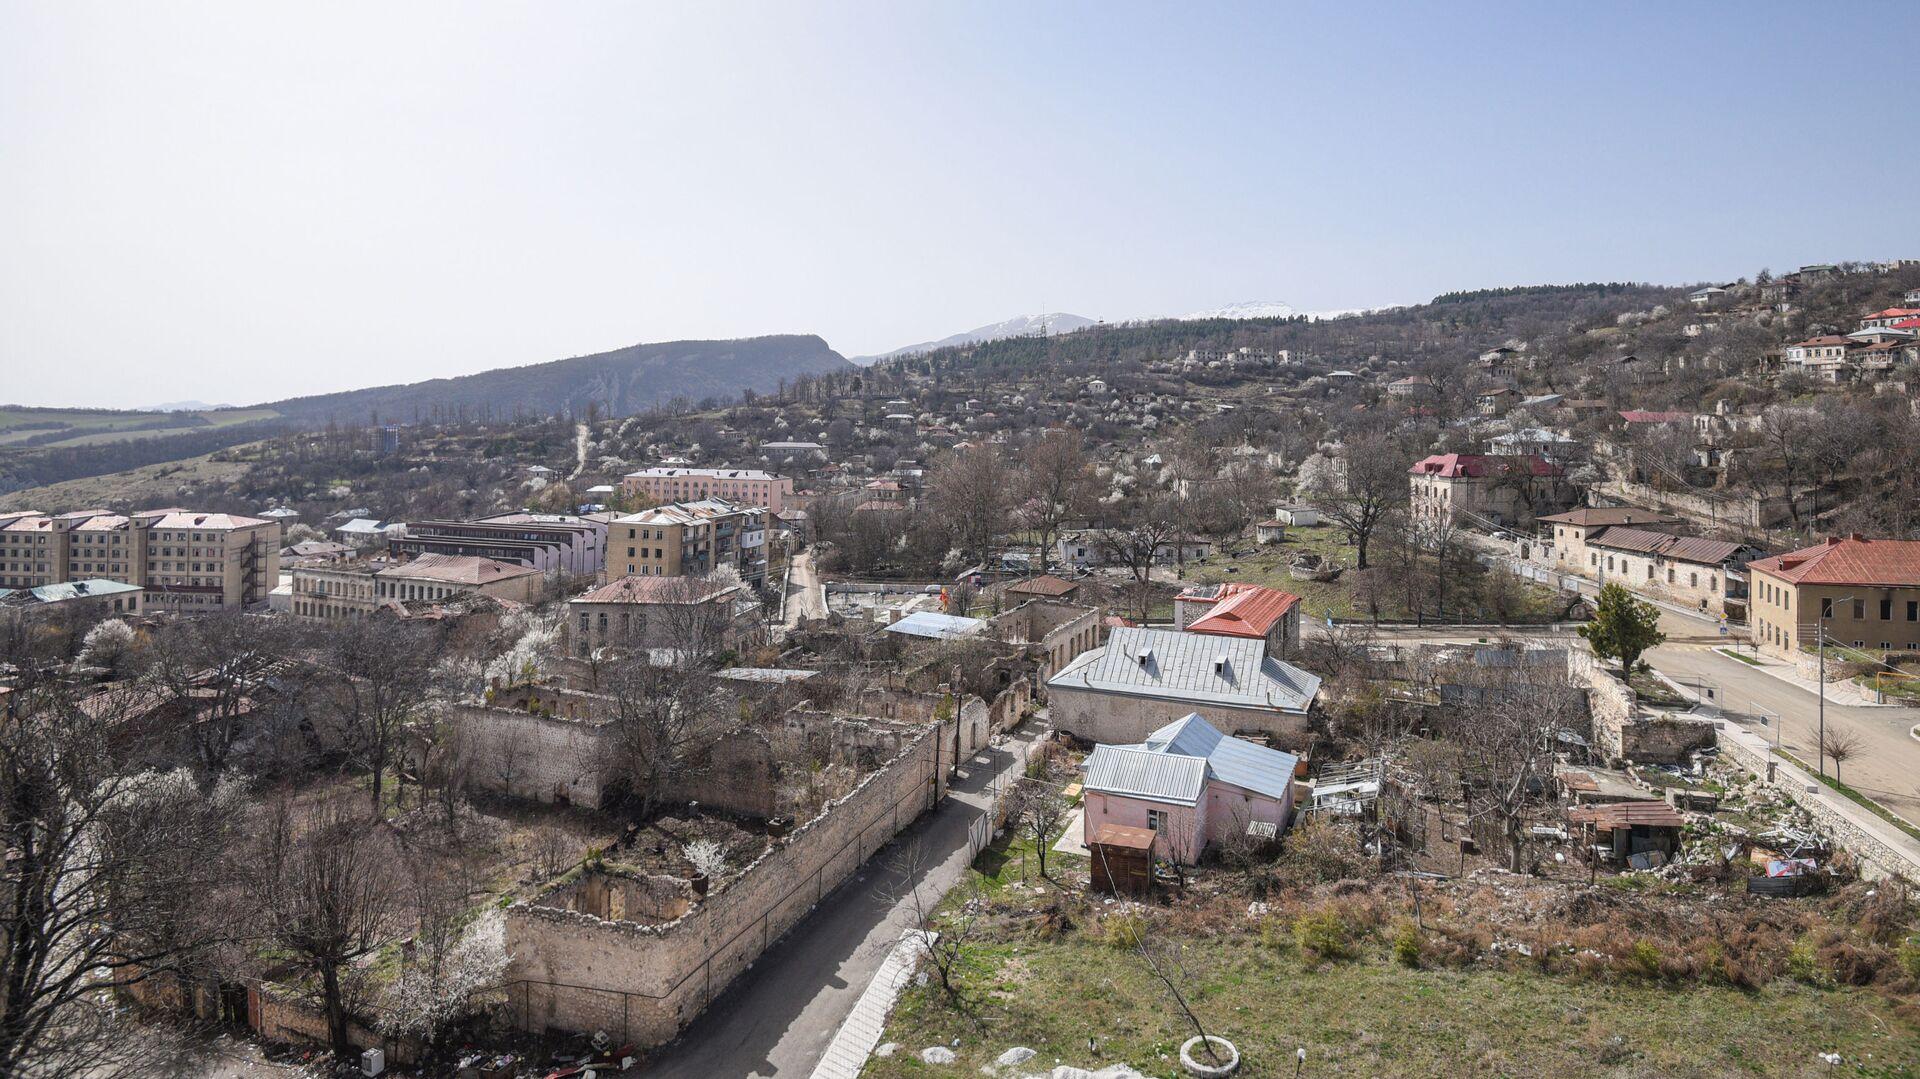 Вид на город Шуша, фото из архива - Sputnik Азербайджан, 1920, 06.09.2021